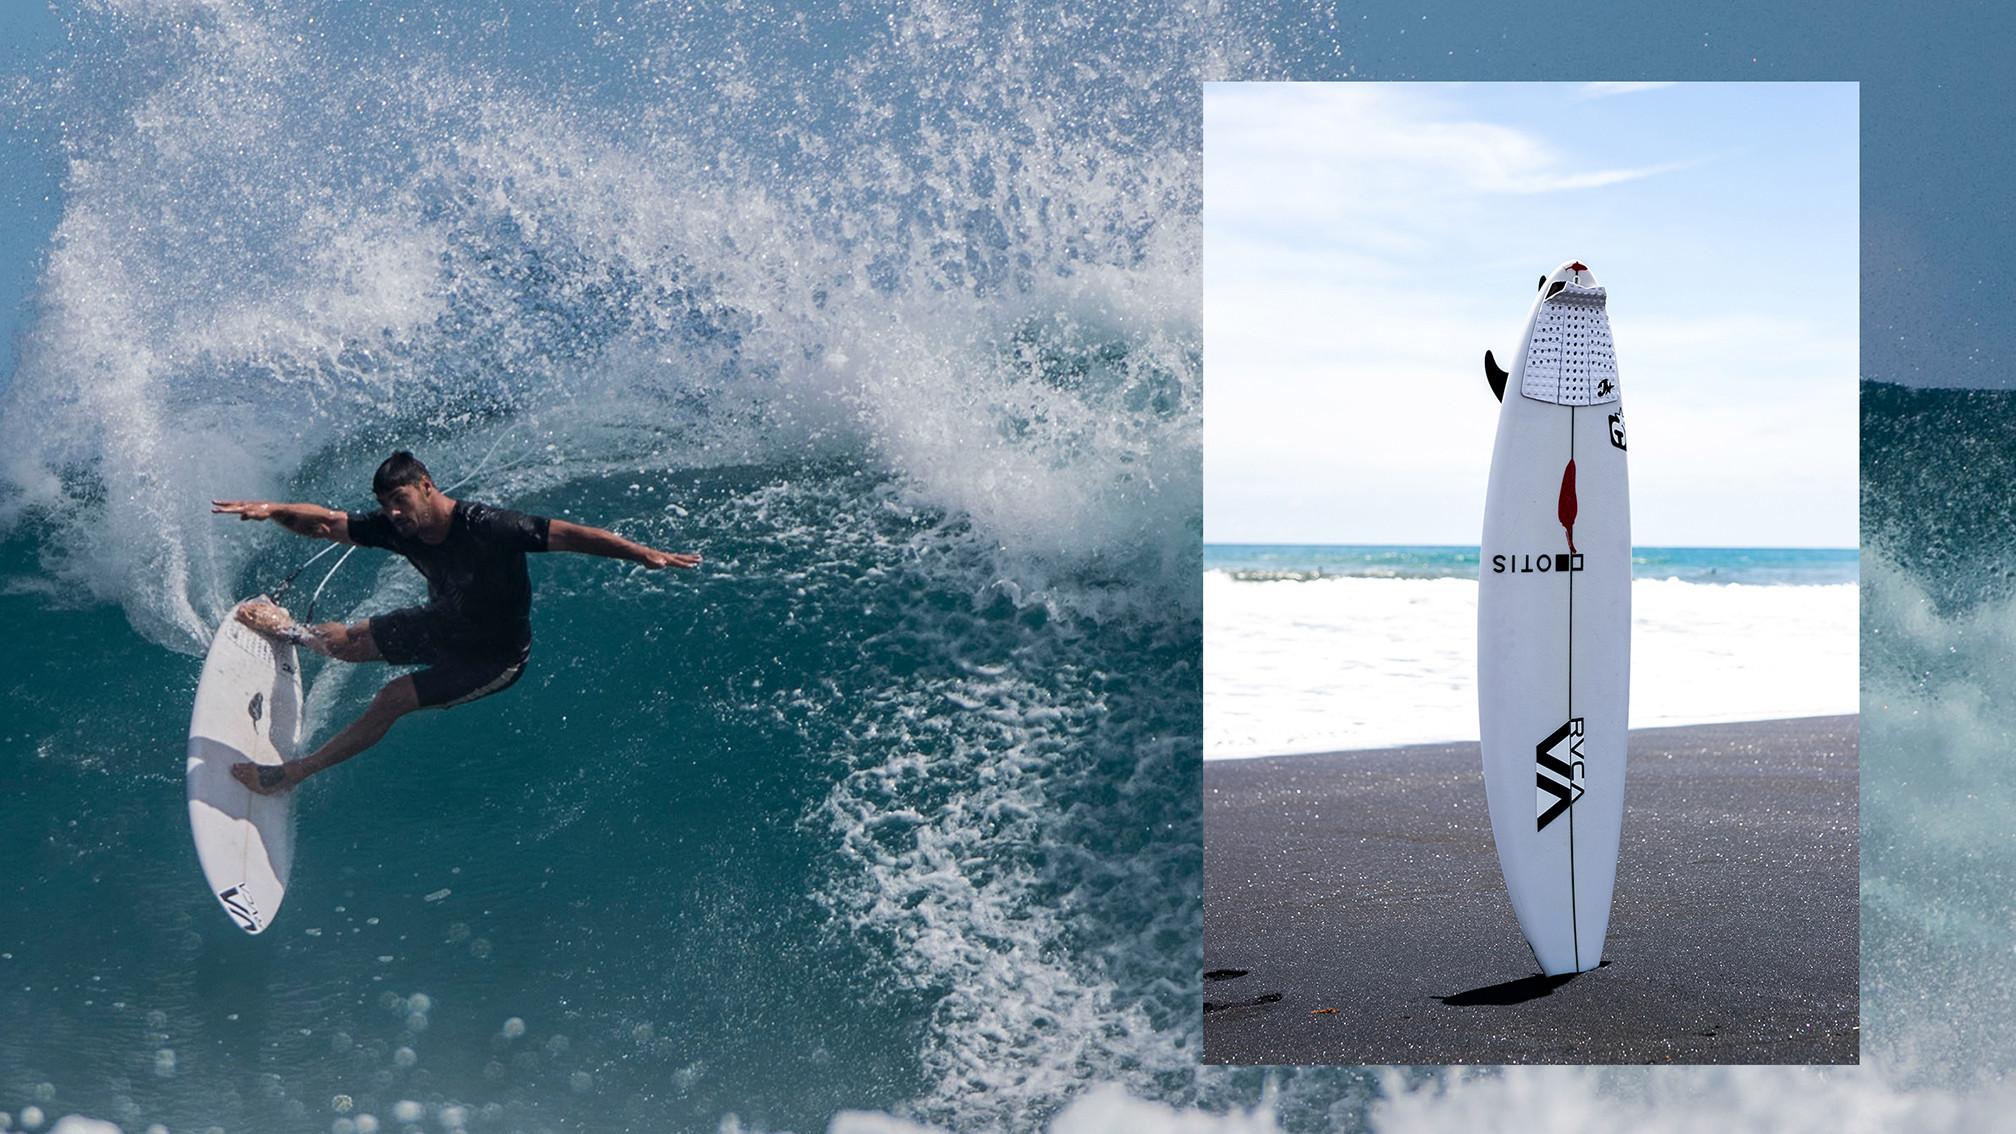 Chiili surfboards